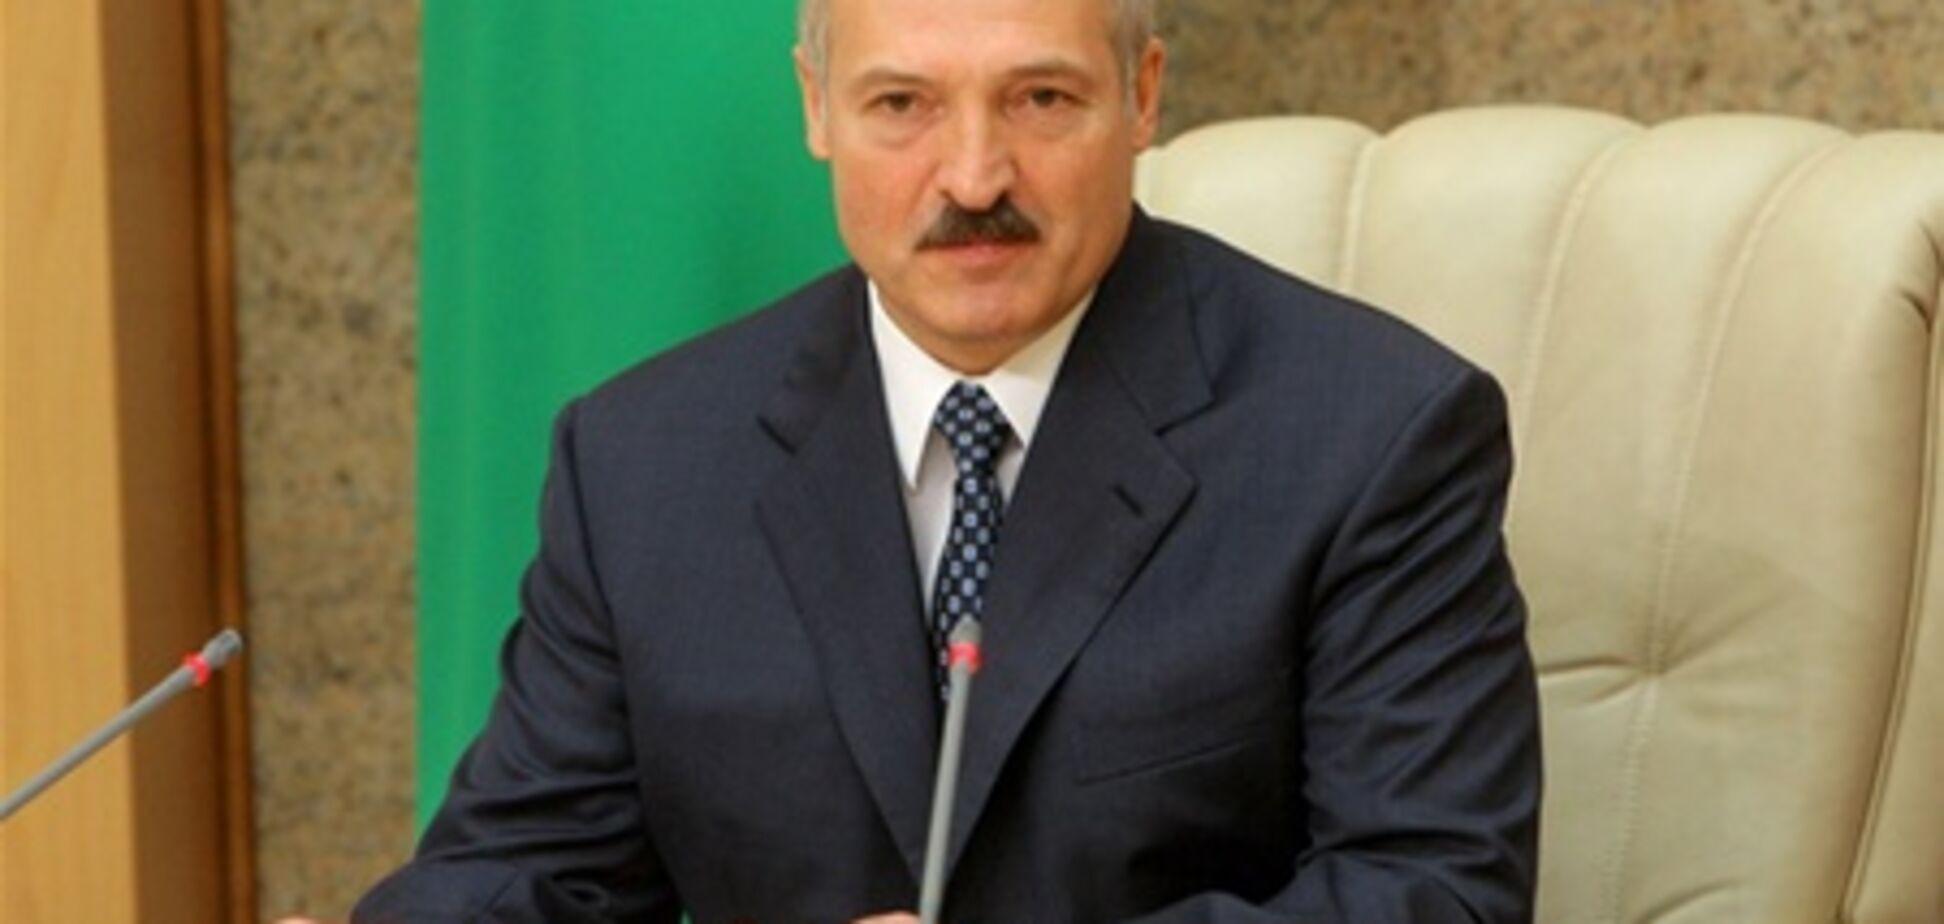 Лукашенко назначил нового главу Нацбанка Беларуси